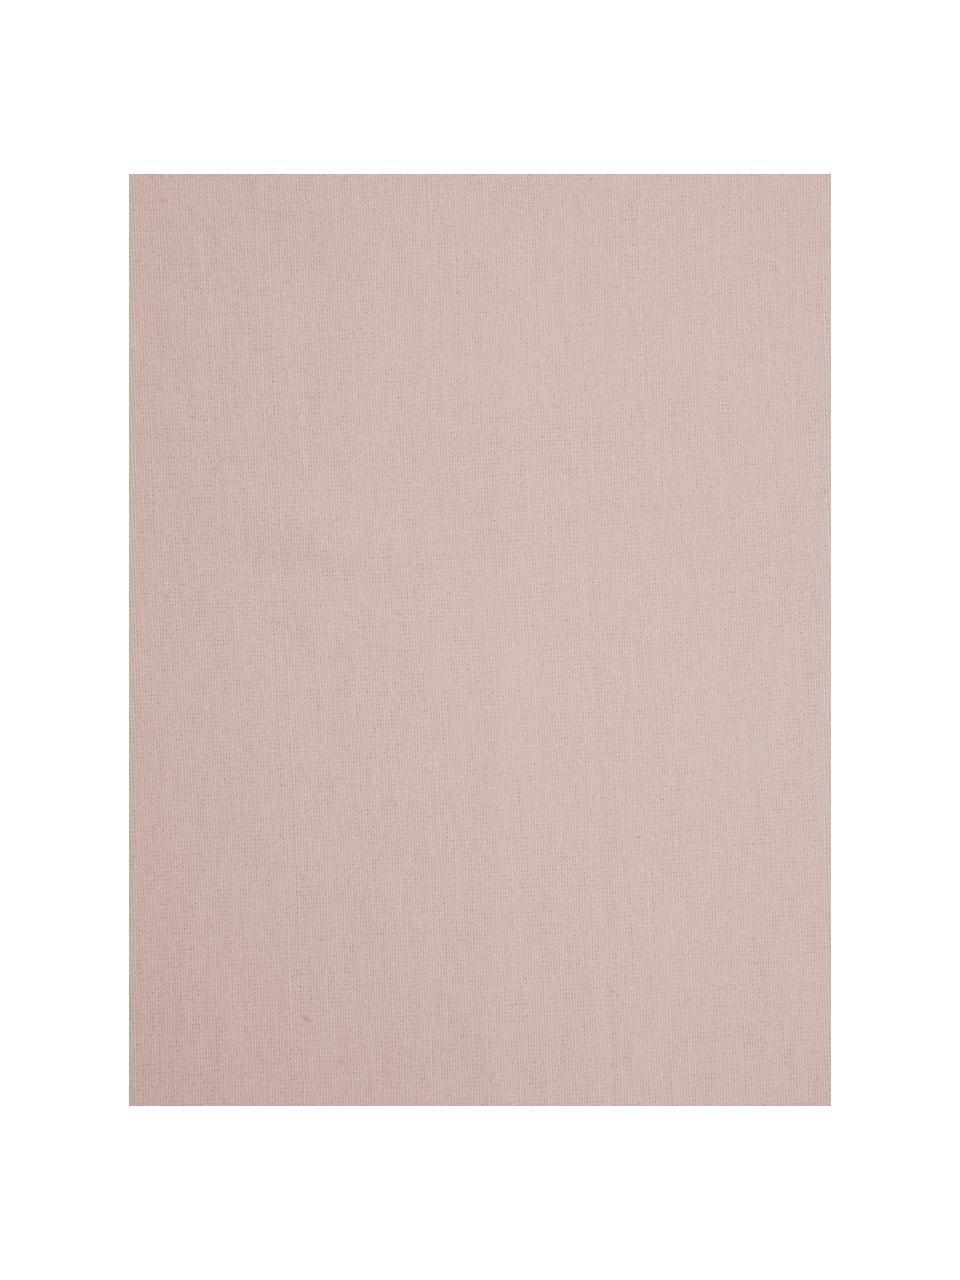 Flanell-Spannbettlaken Biba in Rosa, Webart: Flanell, Rosa, 90 x 200 cm